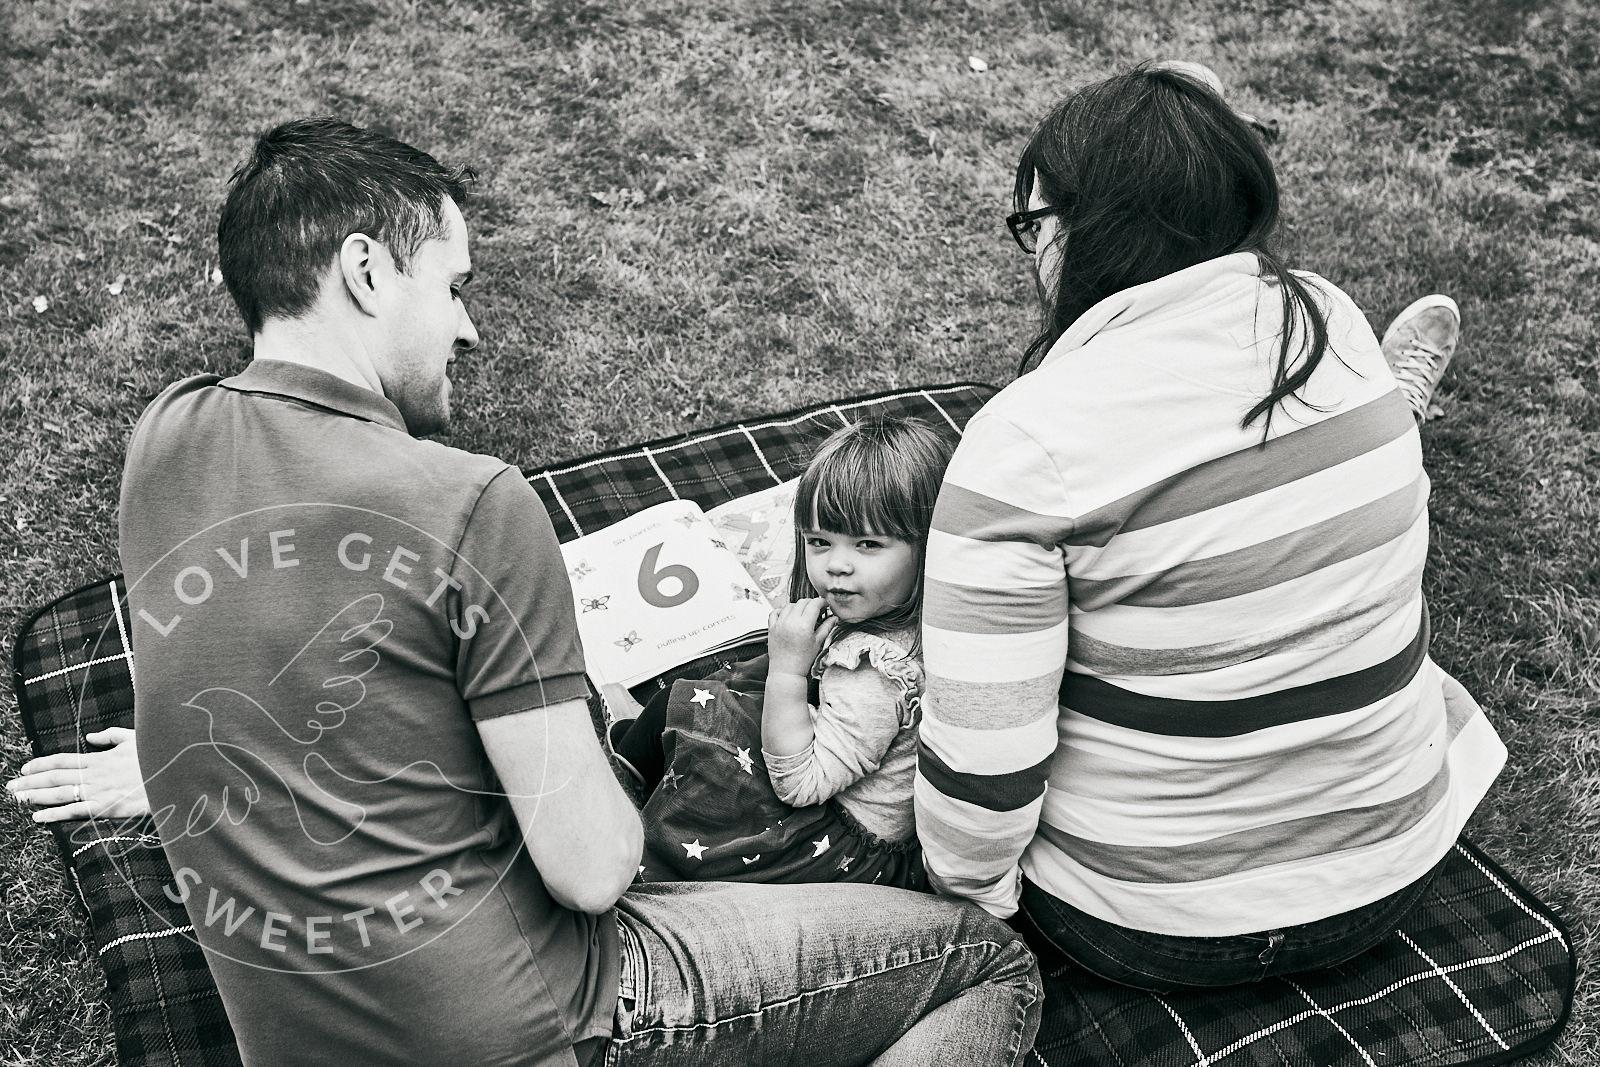 family reading on blanket during natural family shoot